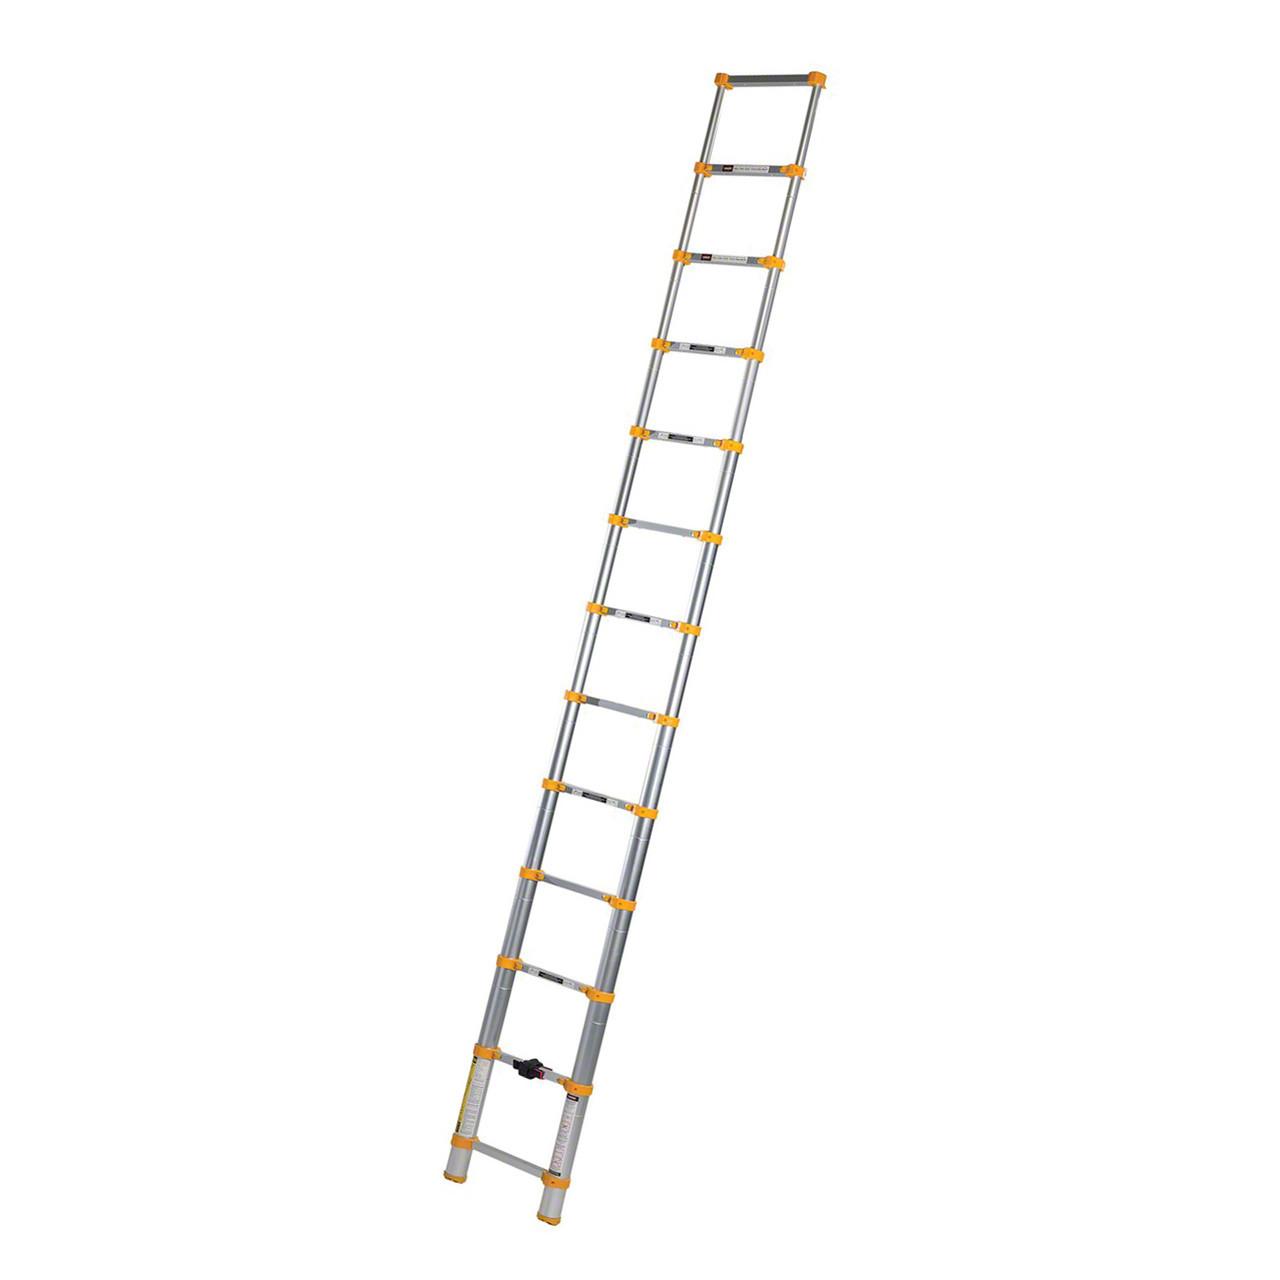 Aluminum telescopic ladder extended